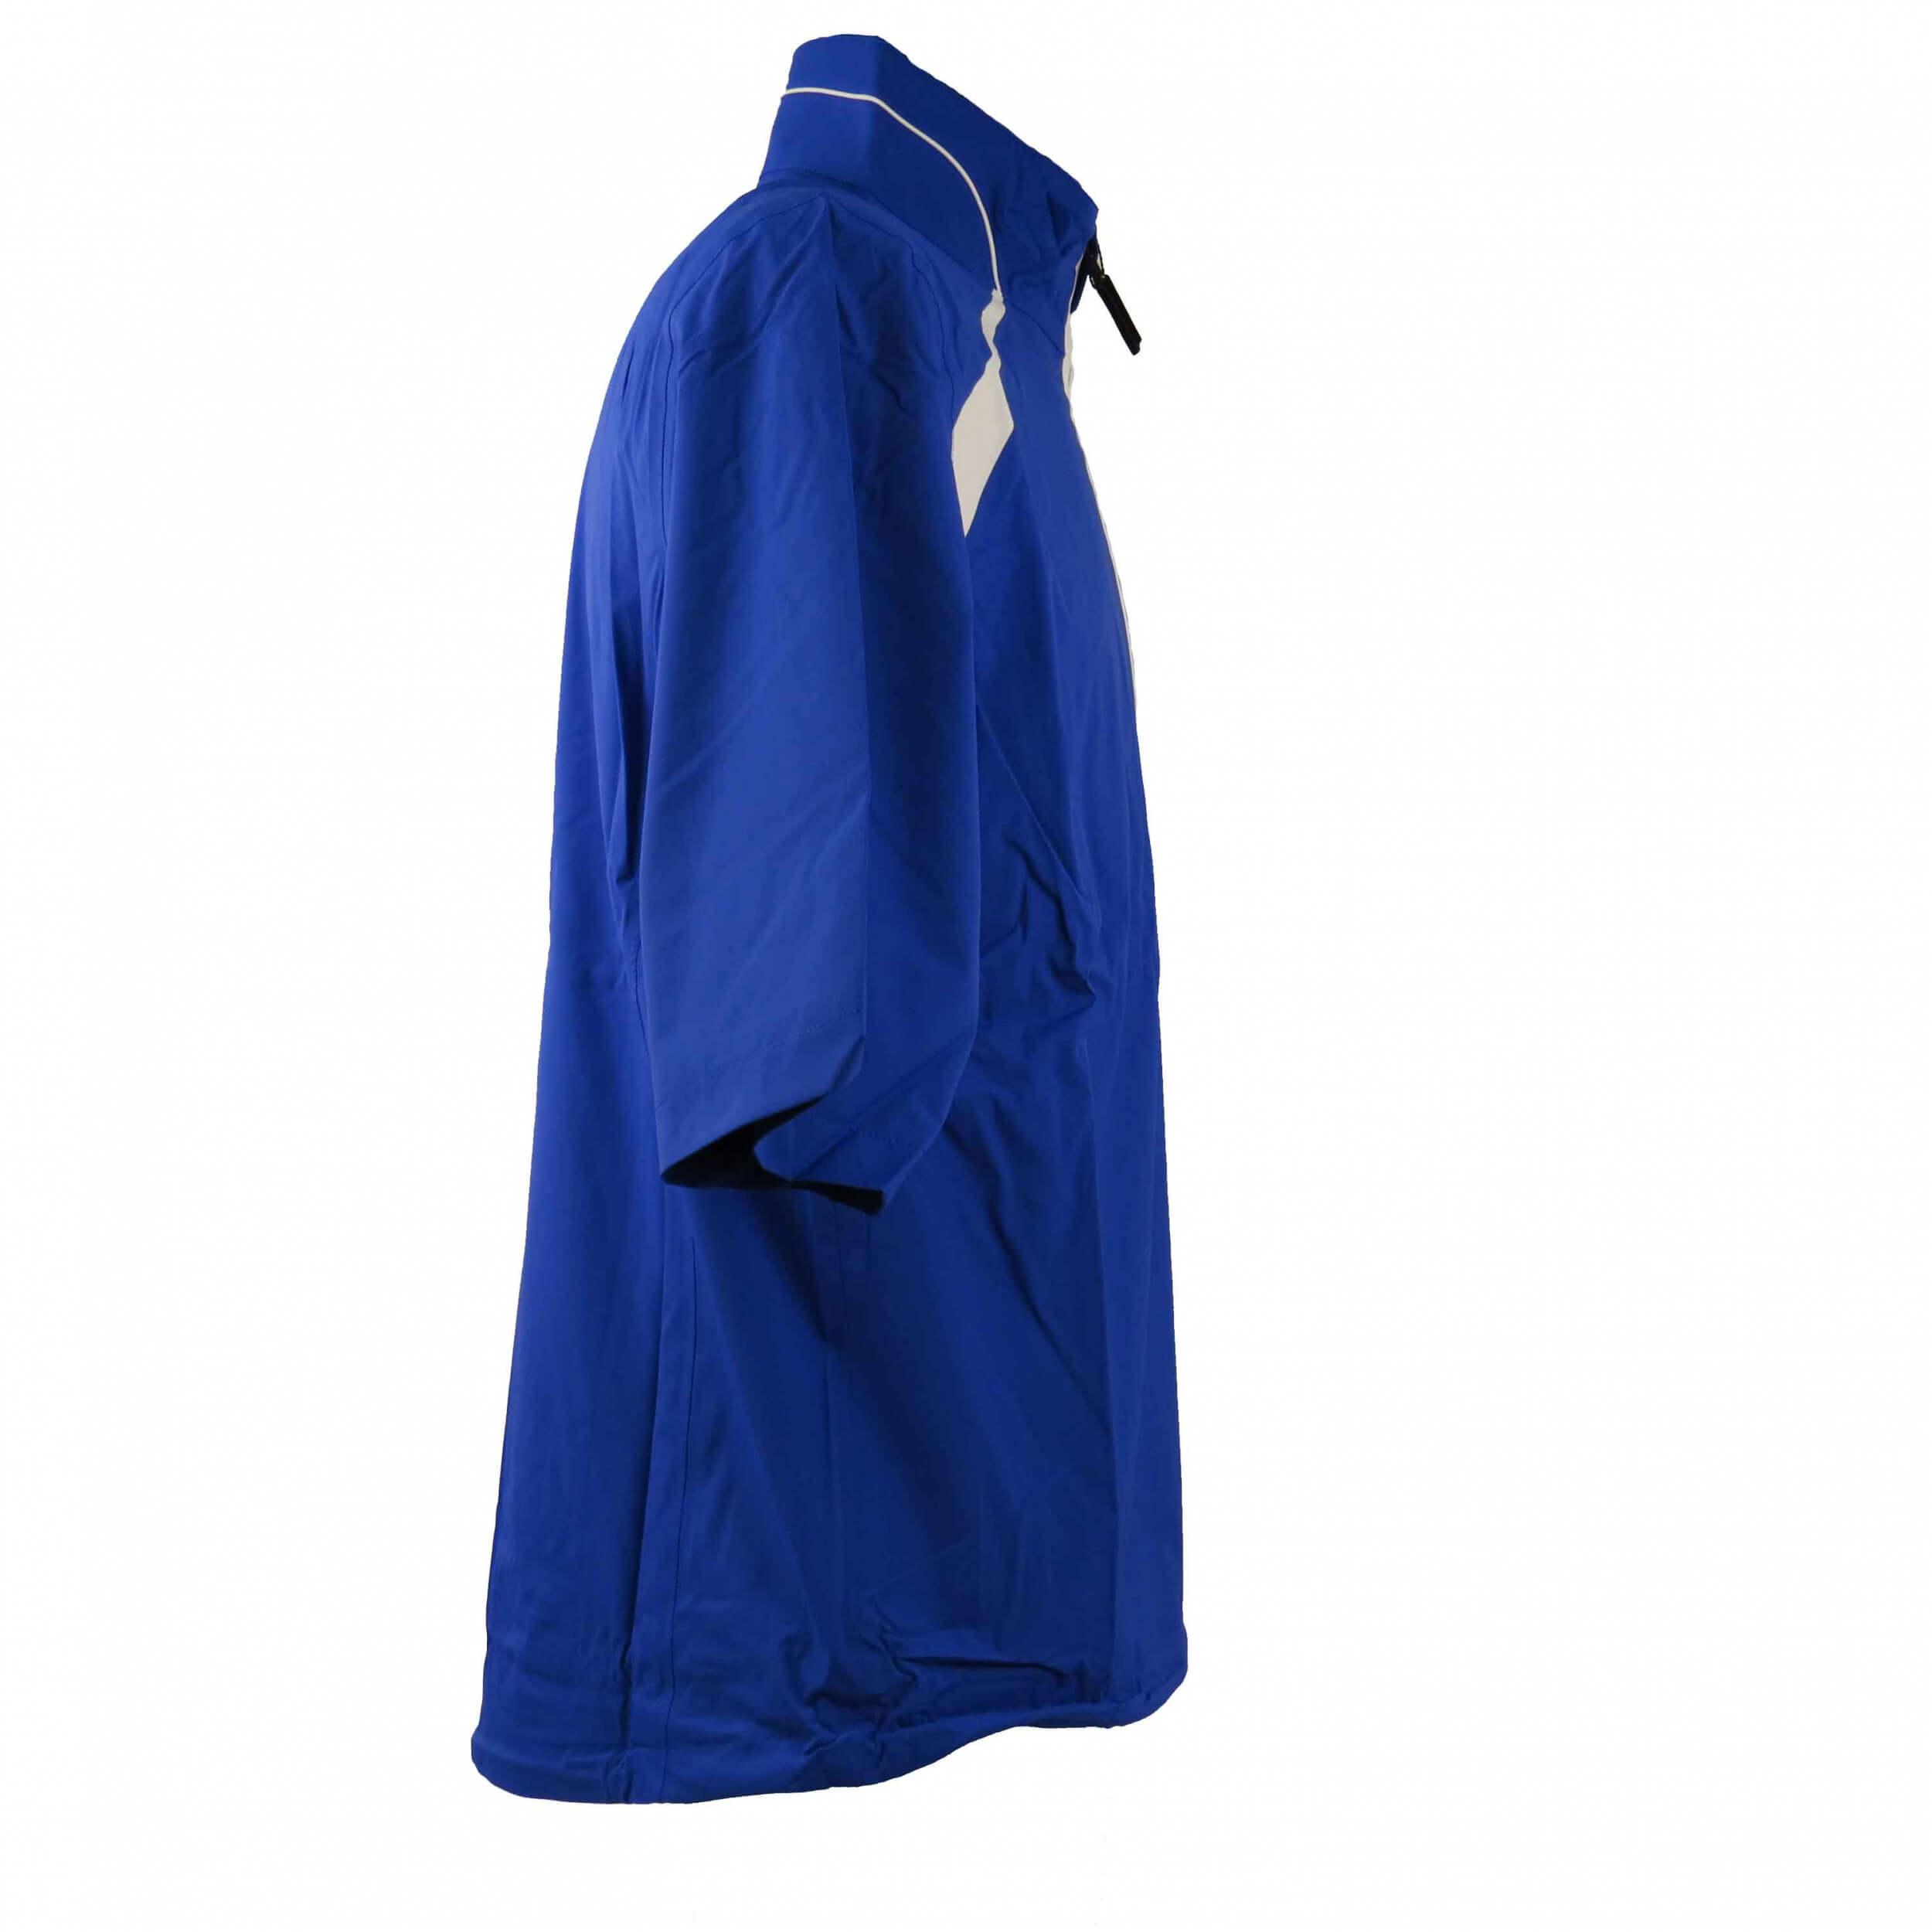 Chervo kurz Arm Regenshirt Ringer AQUA BLOCK blau 594